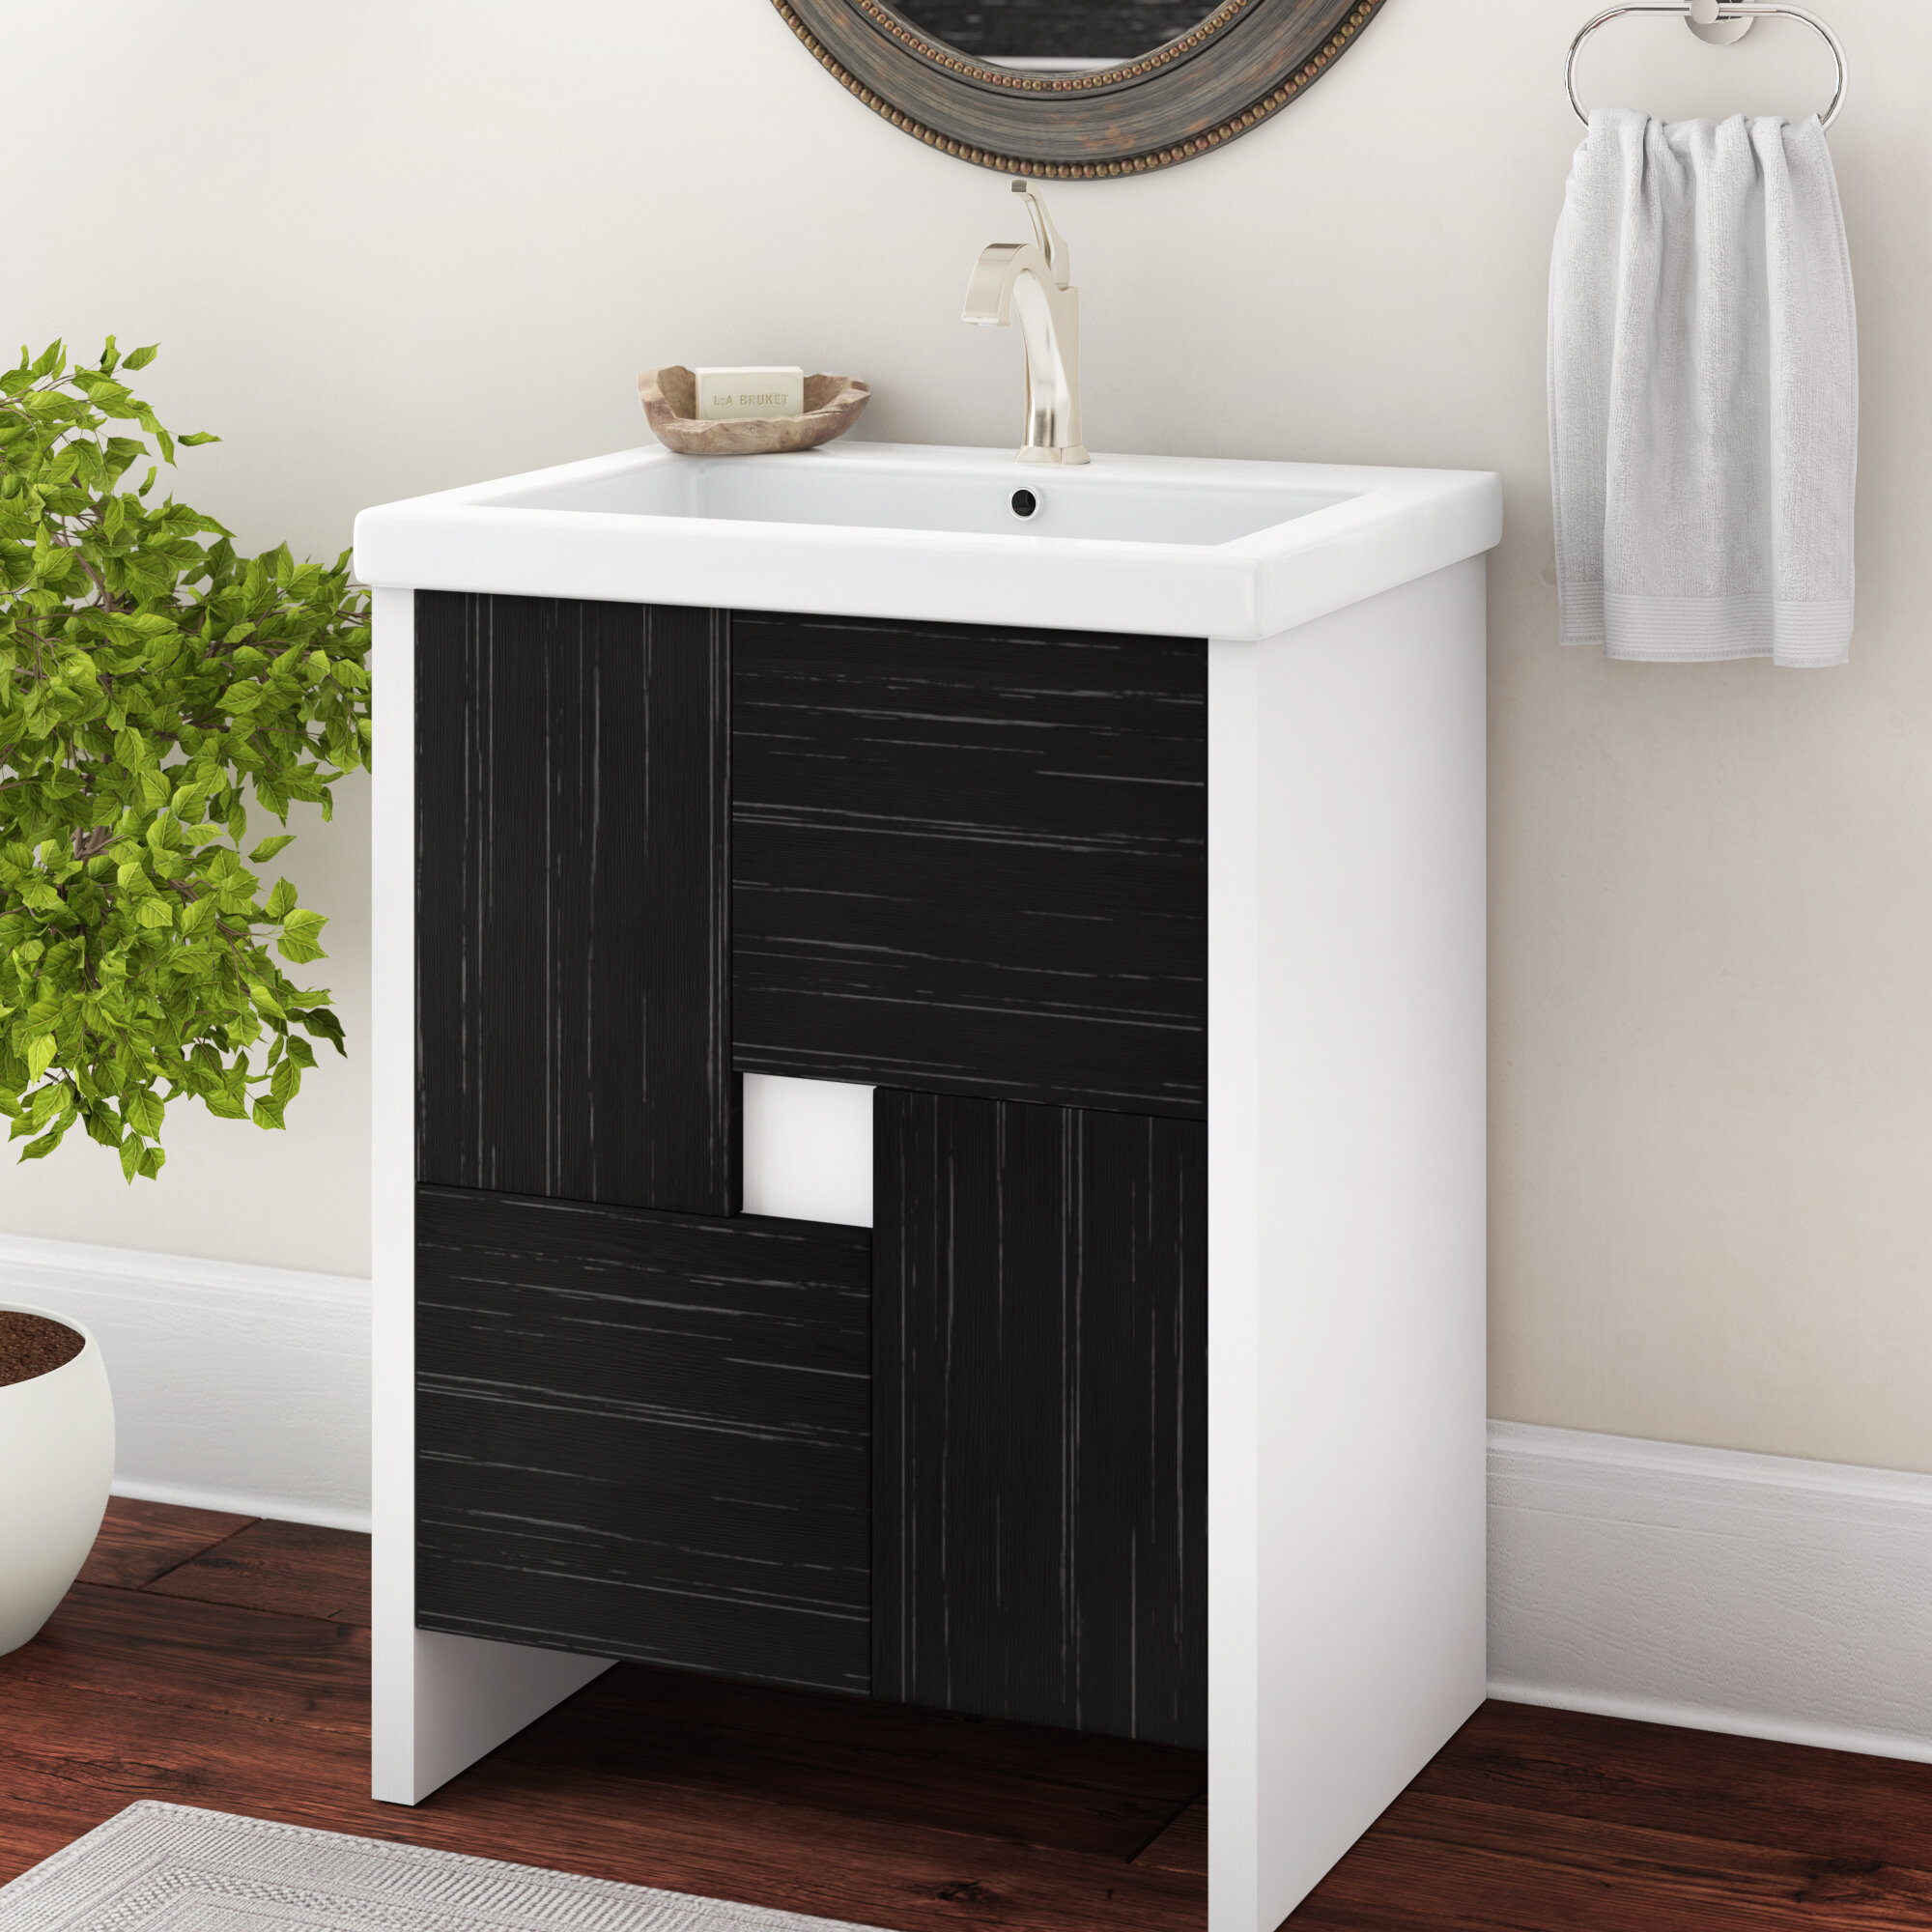 Zipcode Design Tifton 24 Single Bathroom Vanity Set Reviews Wayfair